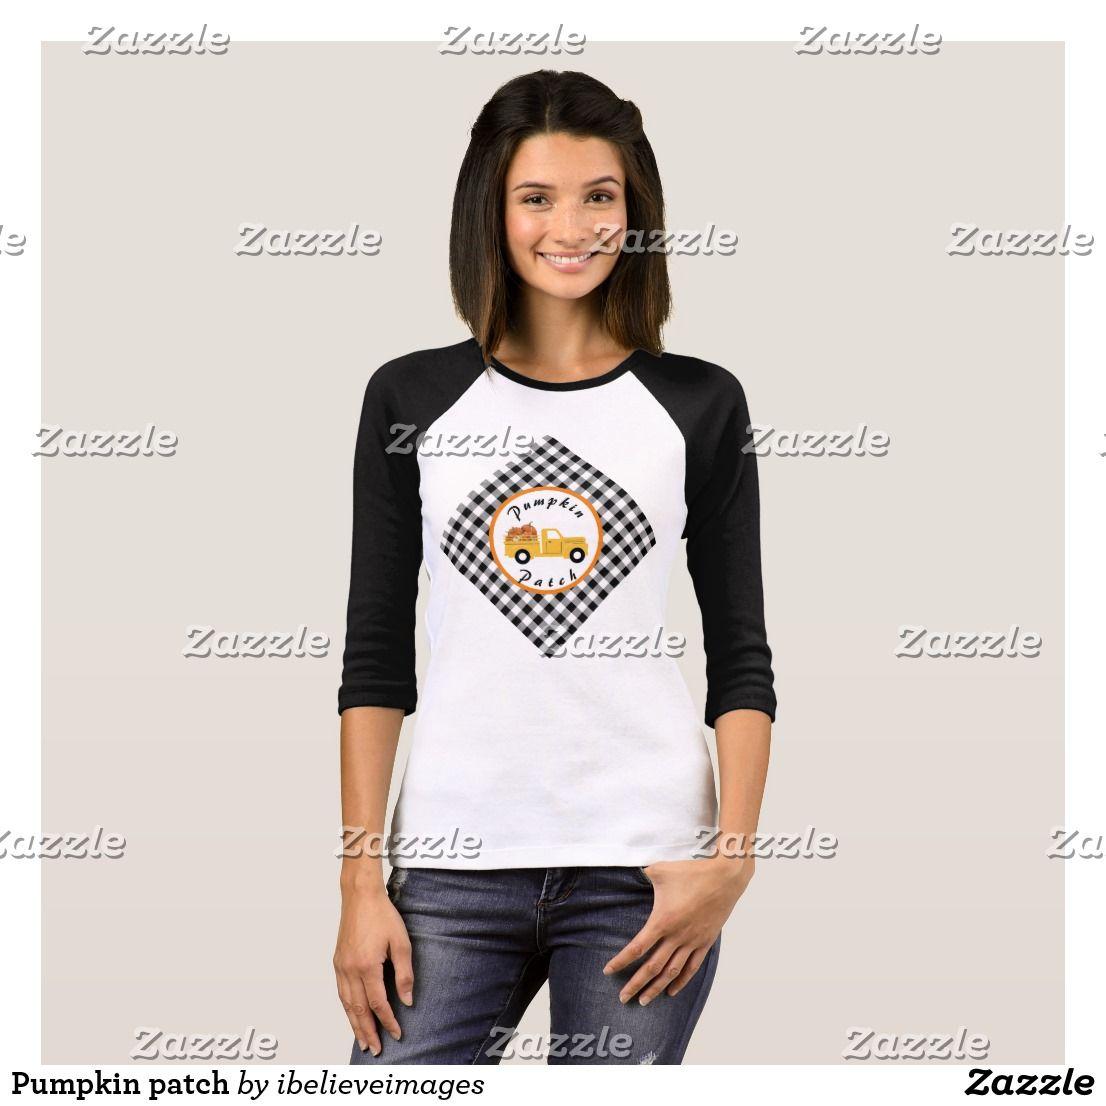 Pumpkin patch TShirt Casual wardrobe